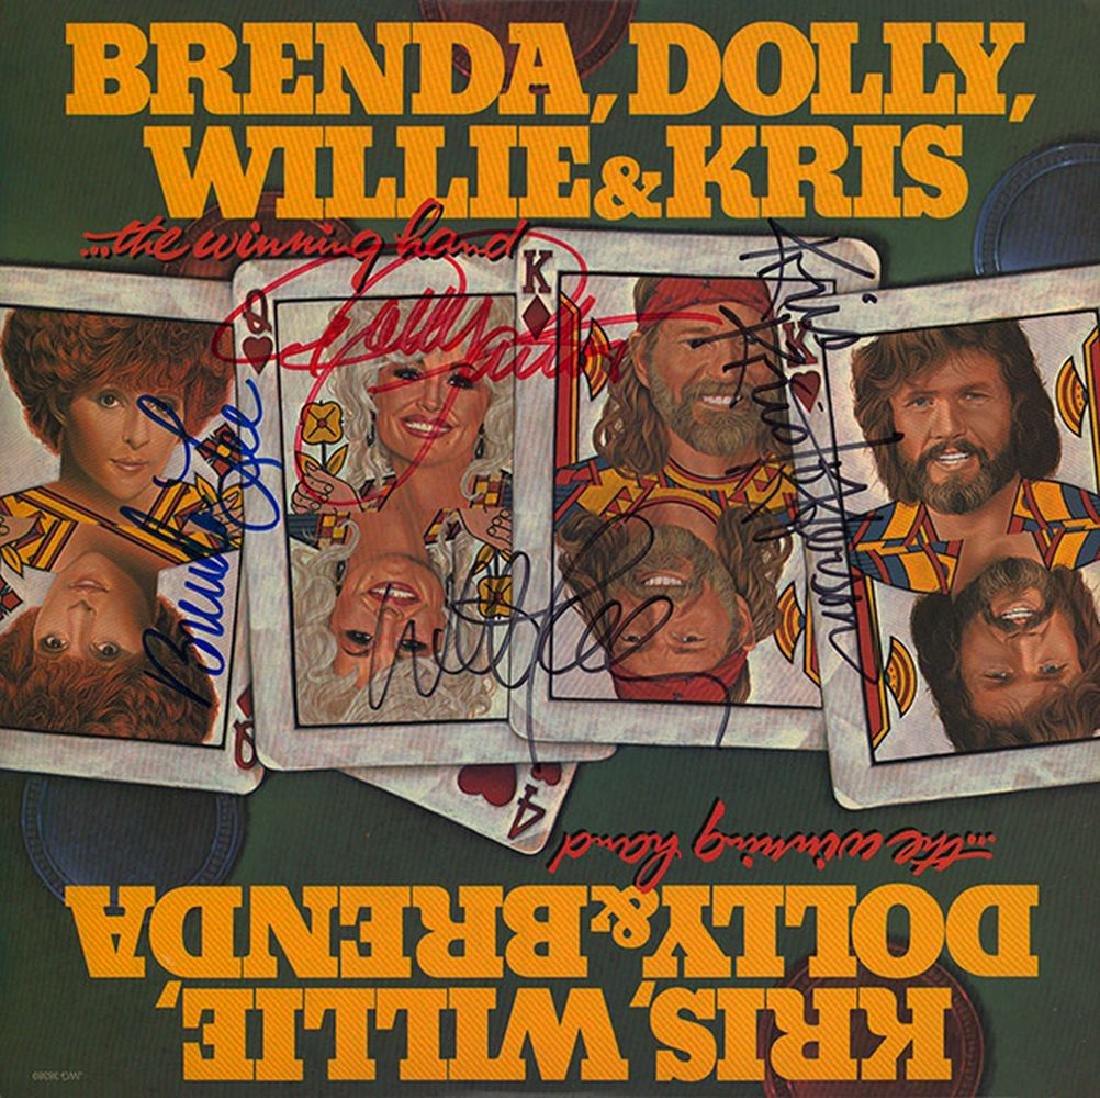 Willie Nelson Kris Kristofferson Dolly Parton Brenda